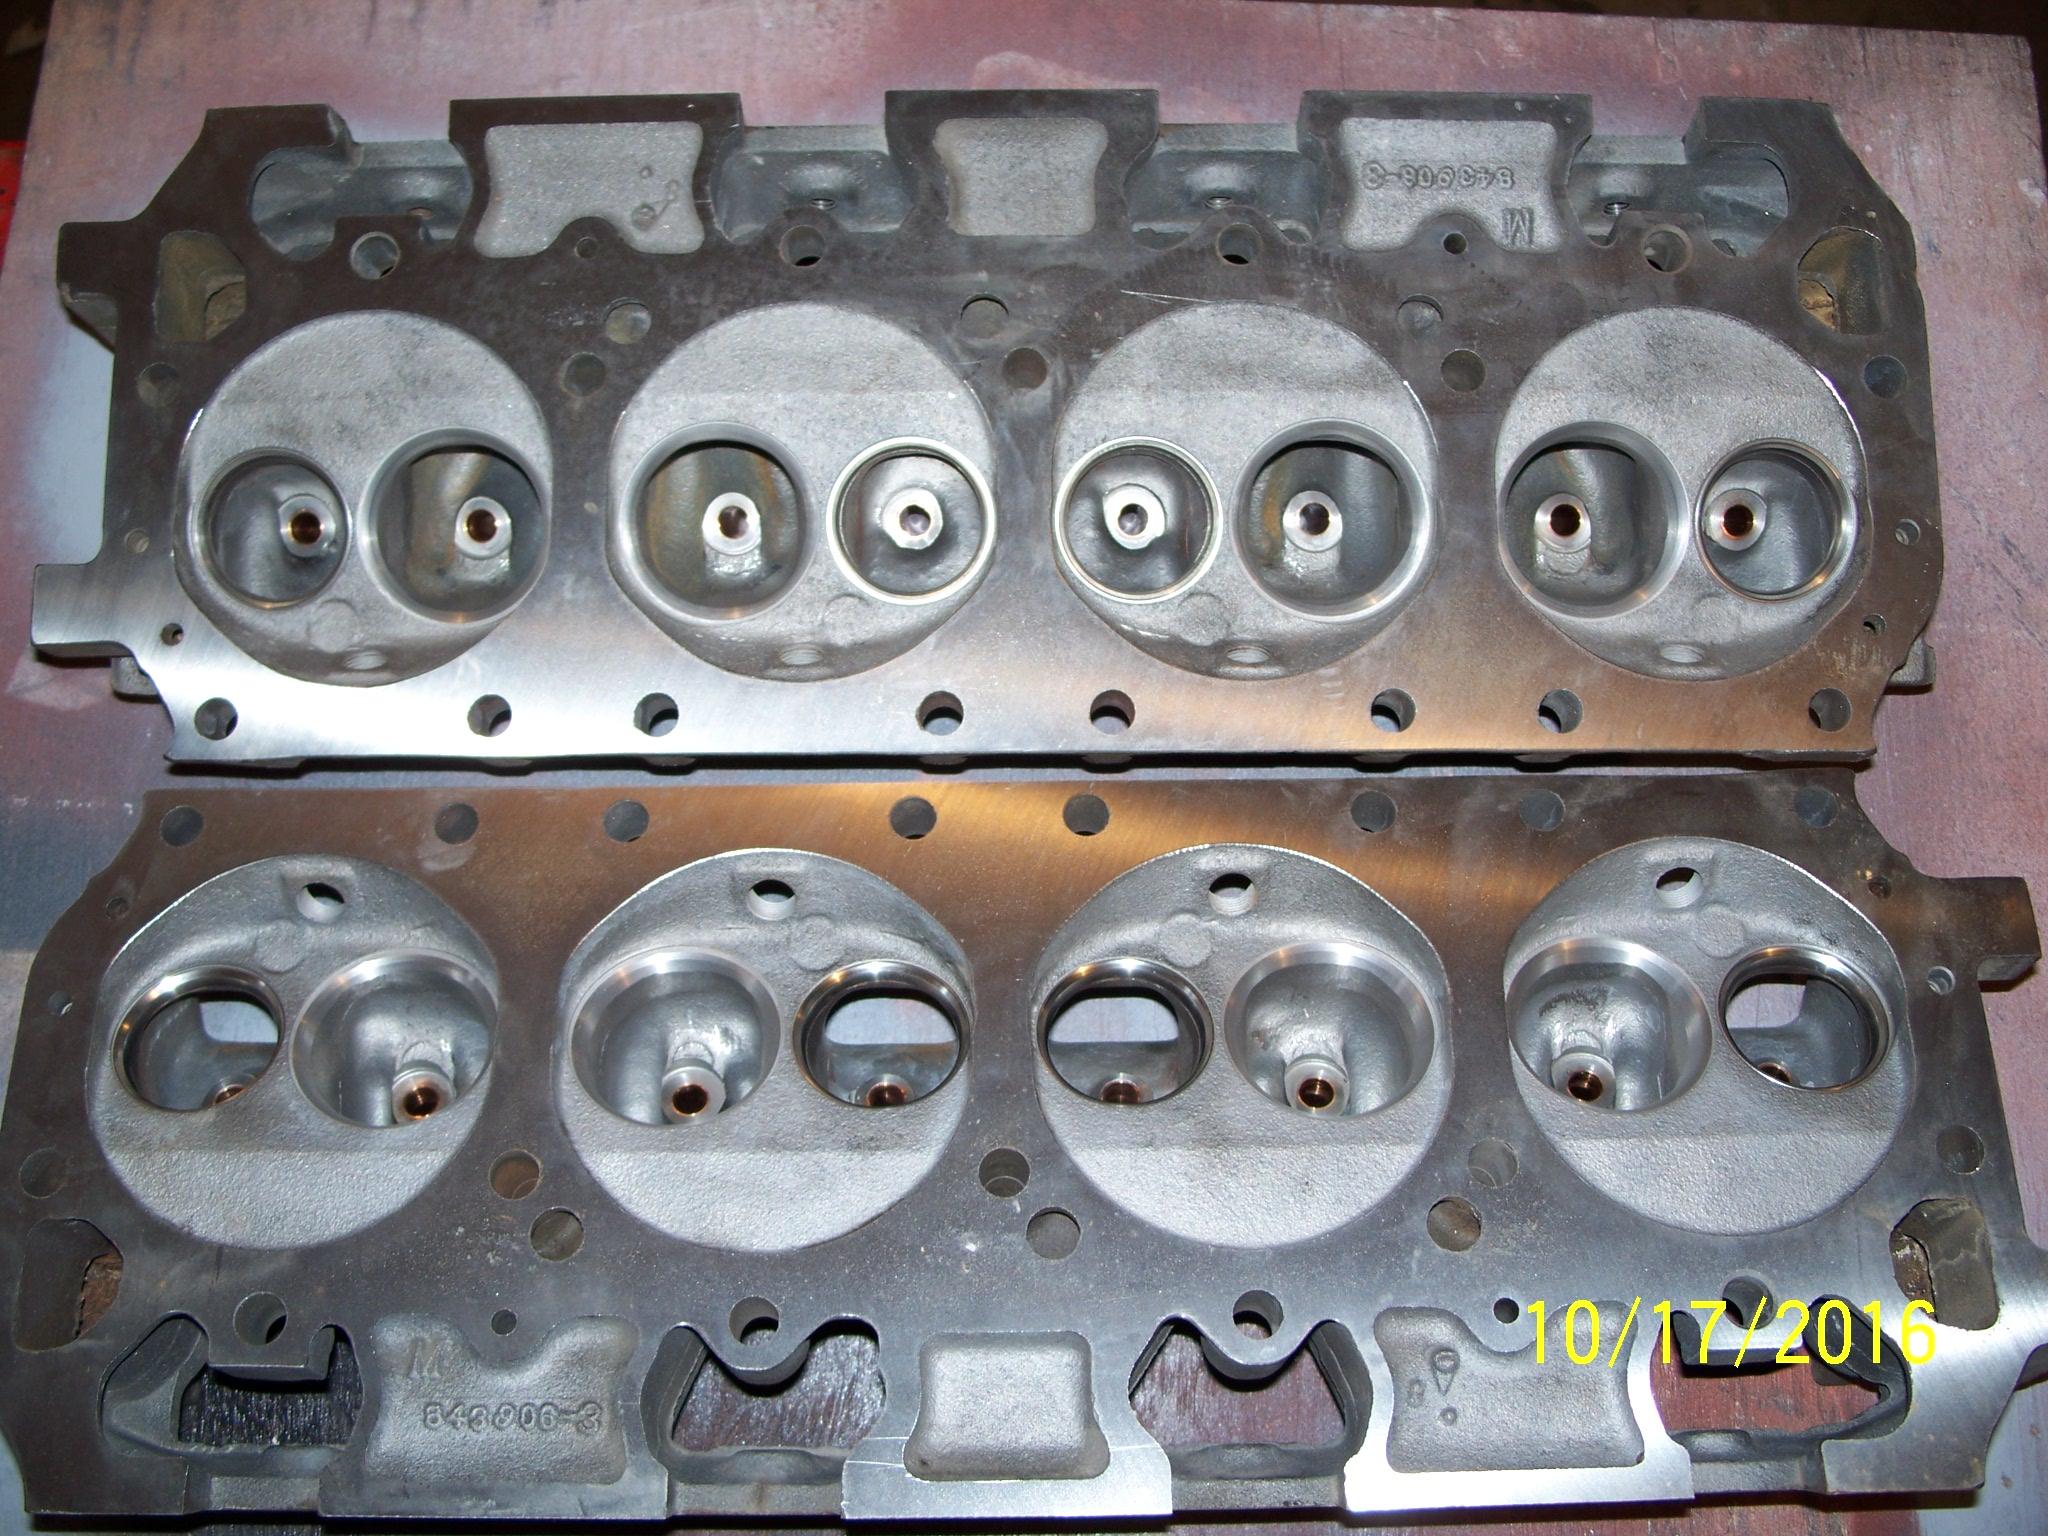 Jakes-440-motor-001